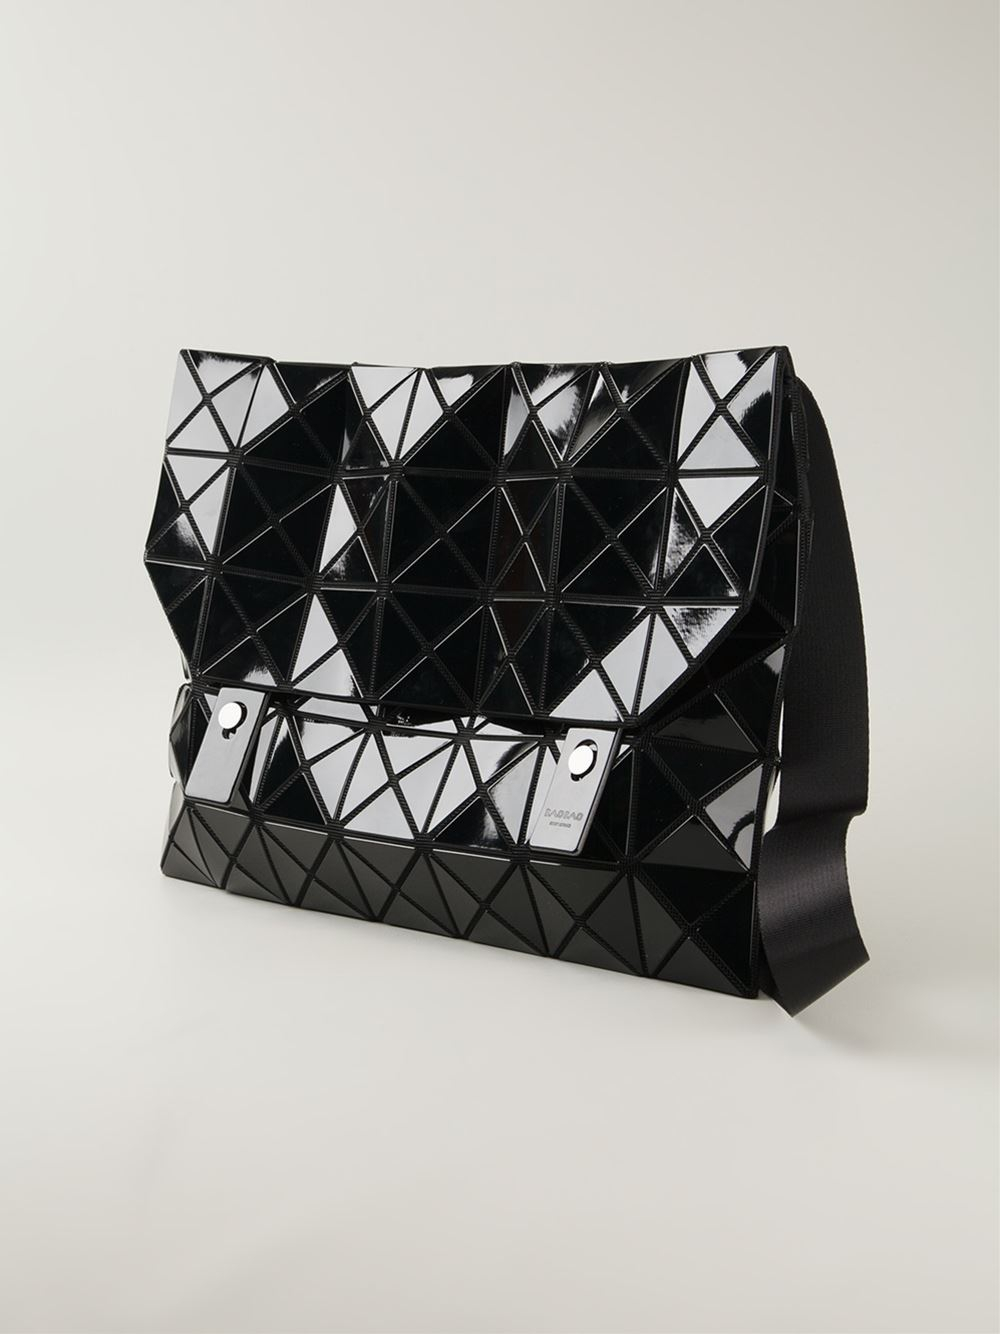 1ebf03f8bd Lyst - Bao Bao Issey Miyake Rock Basic Shoulder Bag in Black